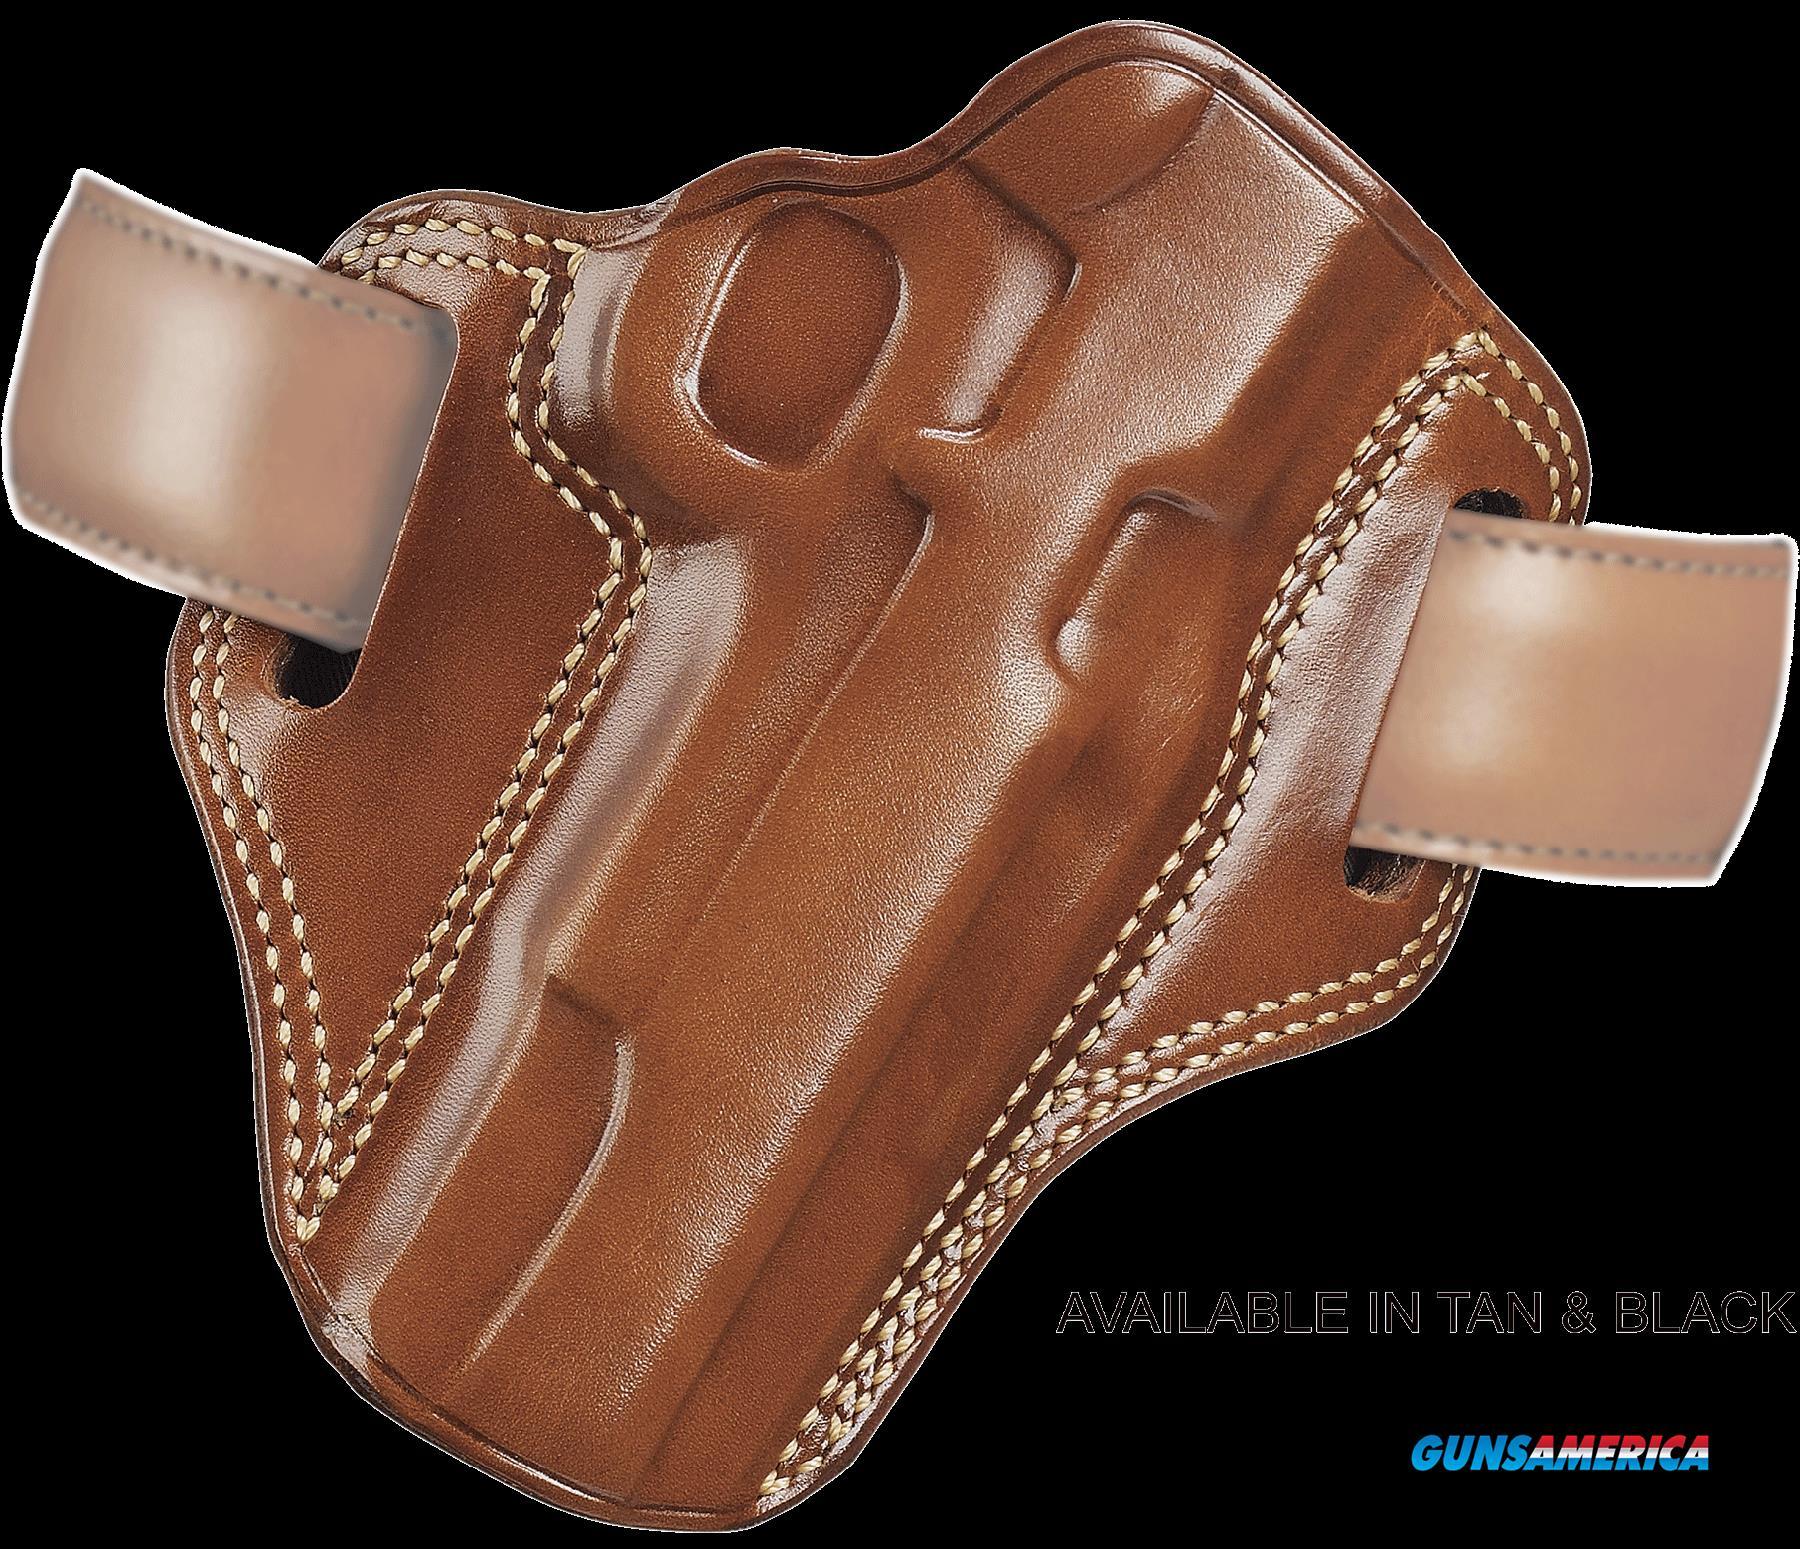 Galco Combat Master, Galco Cm300b  Combat Mster Lcr     Blk  Guns > Pistols > 1911 Pistol Copies (non-Colt)